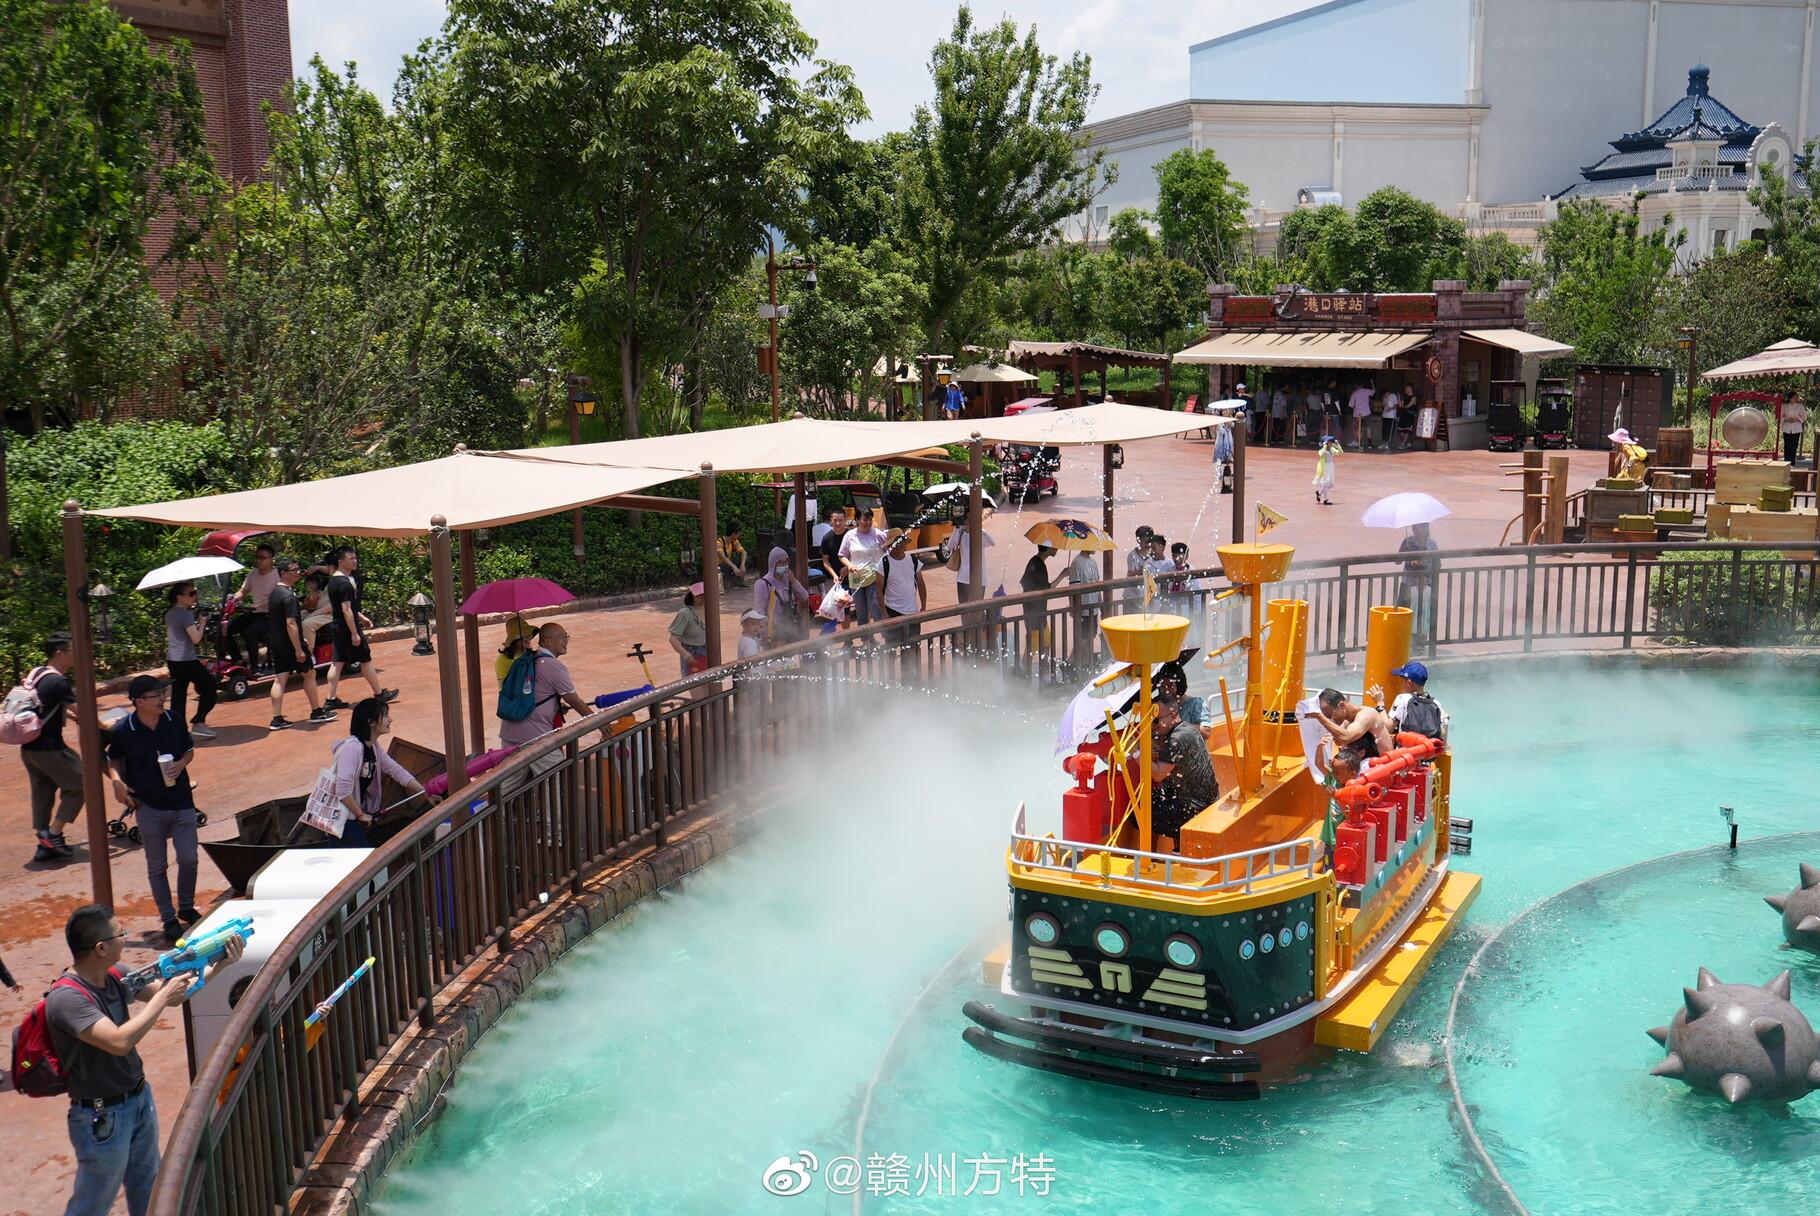 fantawild-theme-parks-65210500.jpg